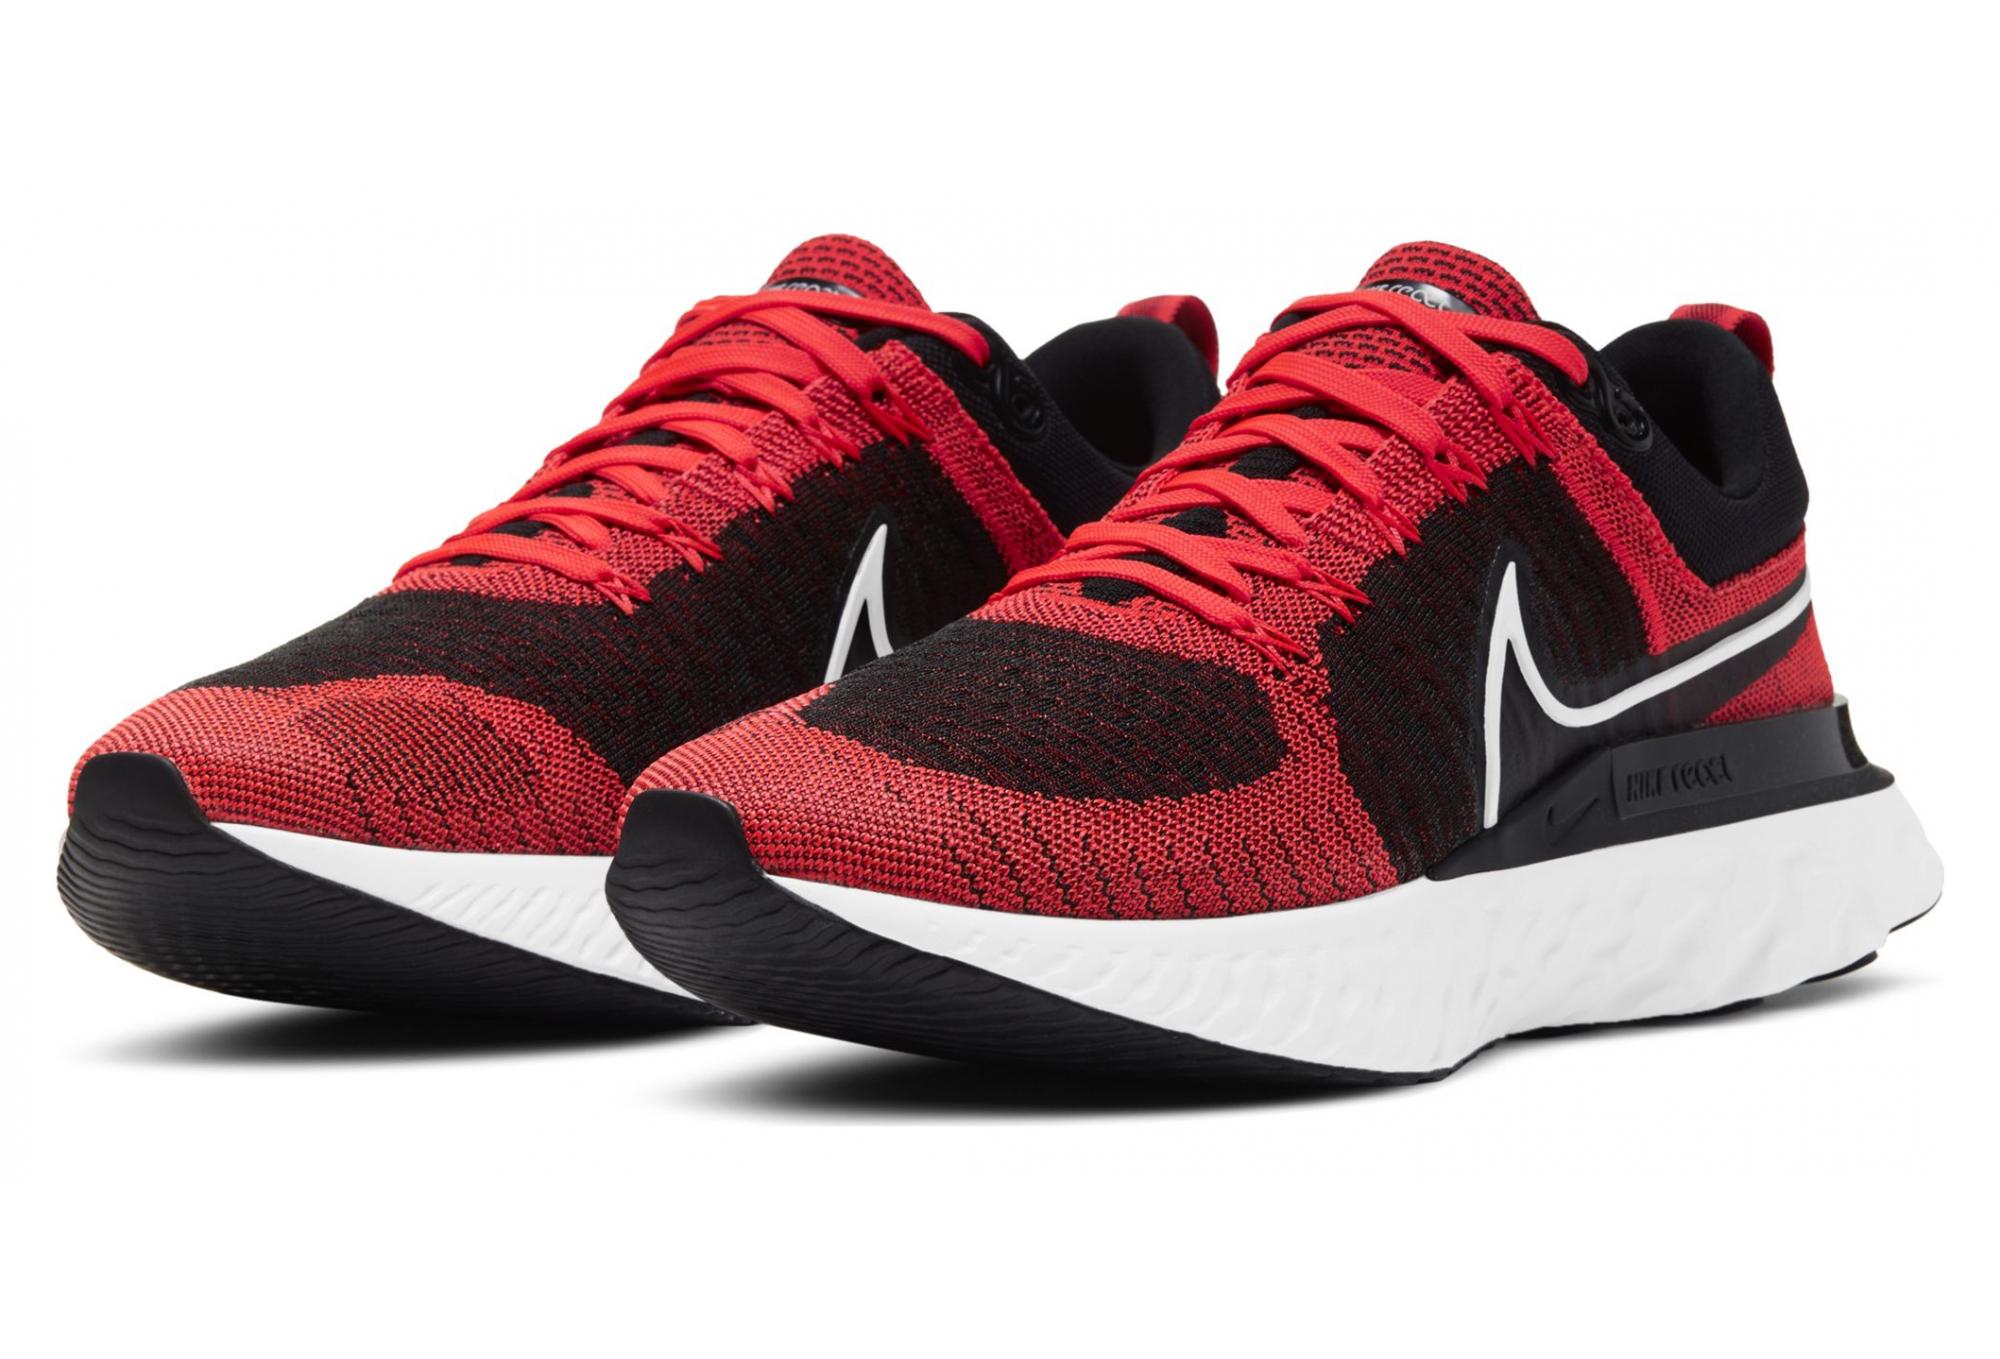 Nike React Infinity Run Flyknit 2 Running Shoes Red Black Men